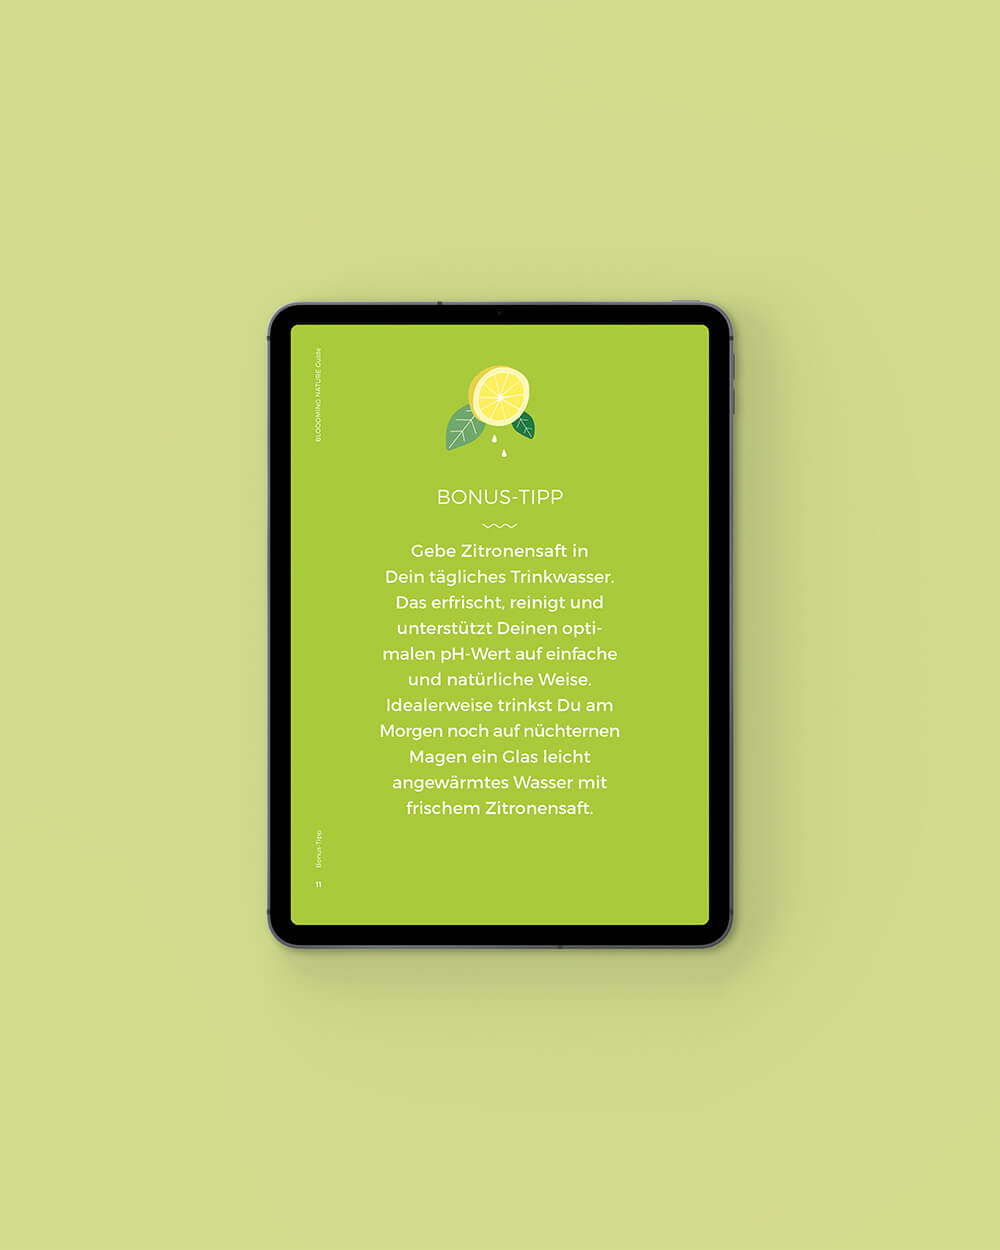 Inhaltsseite vom Bloooming Nature ebook: Bonus Tipp